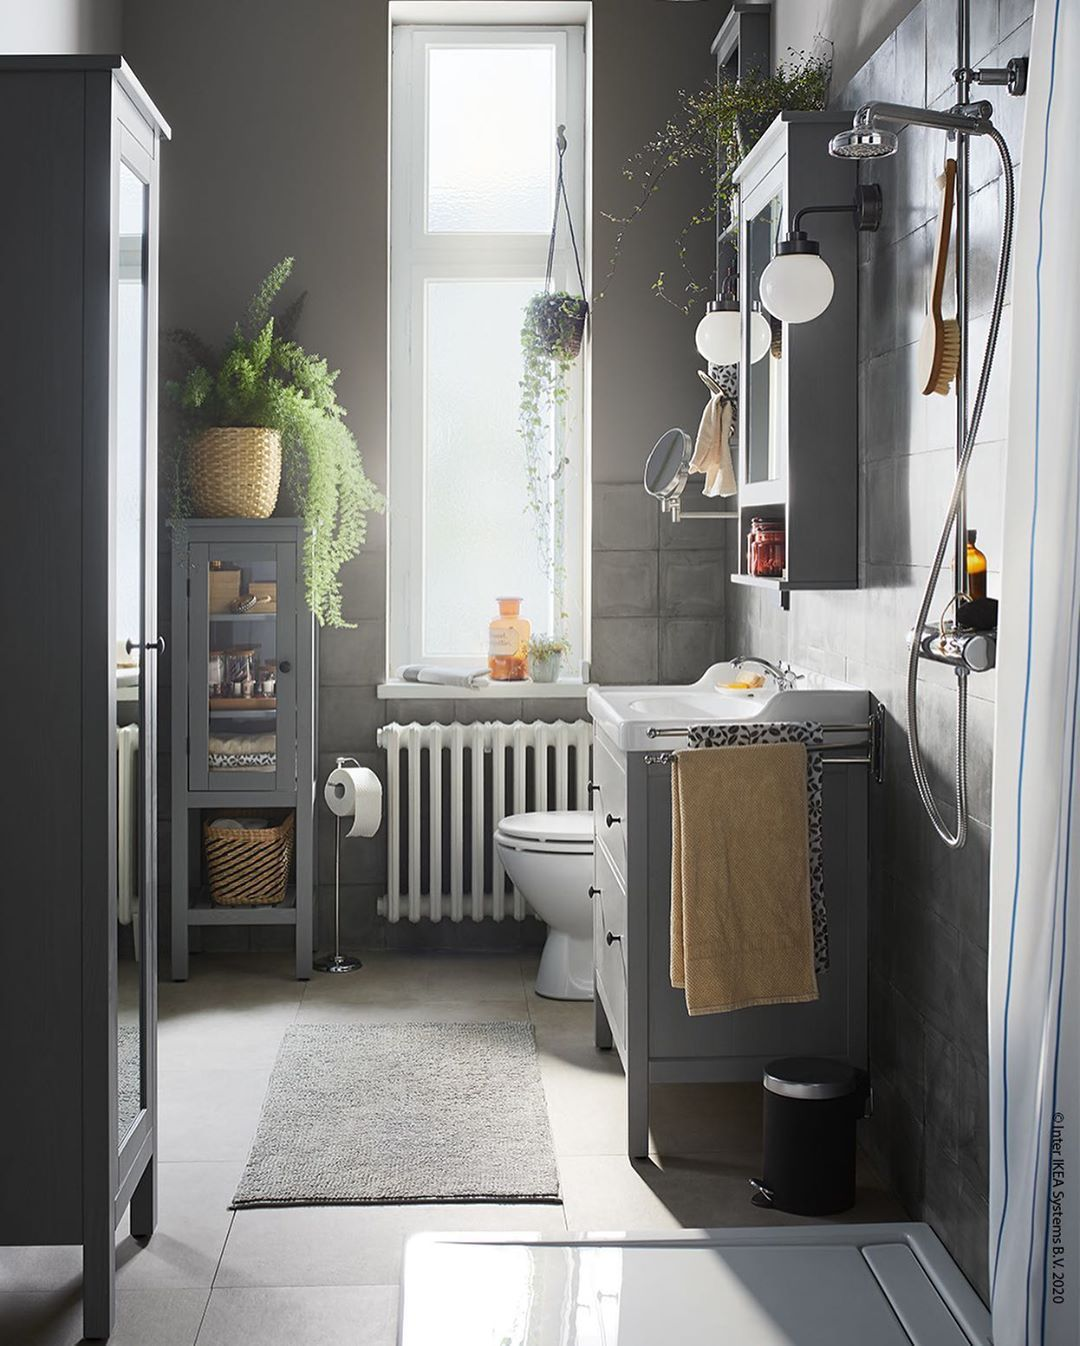 Ikea Deutschland On Instagram Hemnesliebe Im Badezimmer Hemnes Meinikea Ikea Bade In 2020 Inneneinrichtung Badezimmerideen Badezimmer Einrichtung